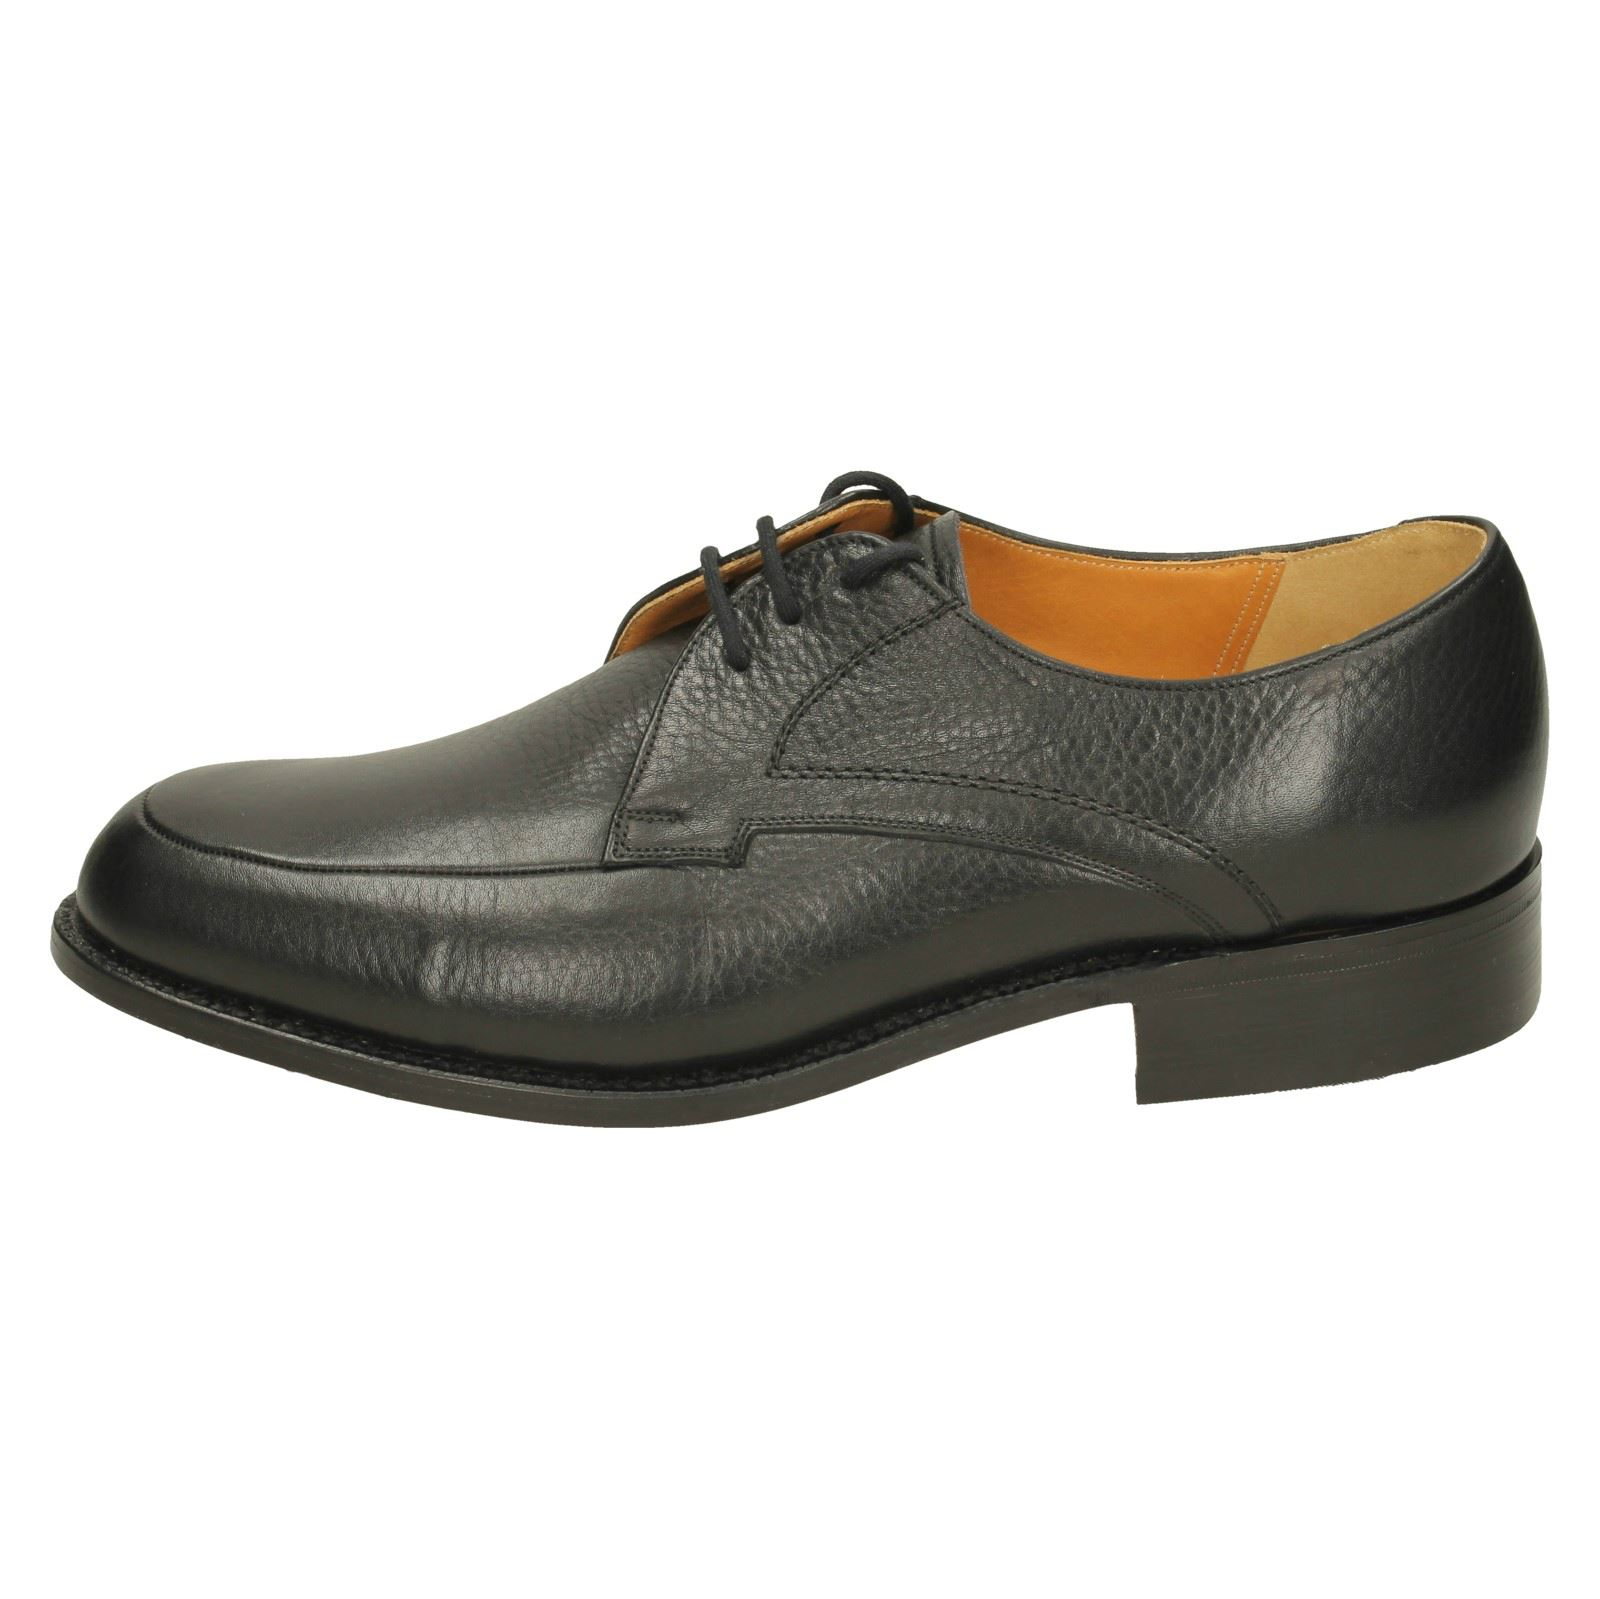 Herren Formal Barker Formal Herren Schuhes Sheridan e76c8a